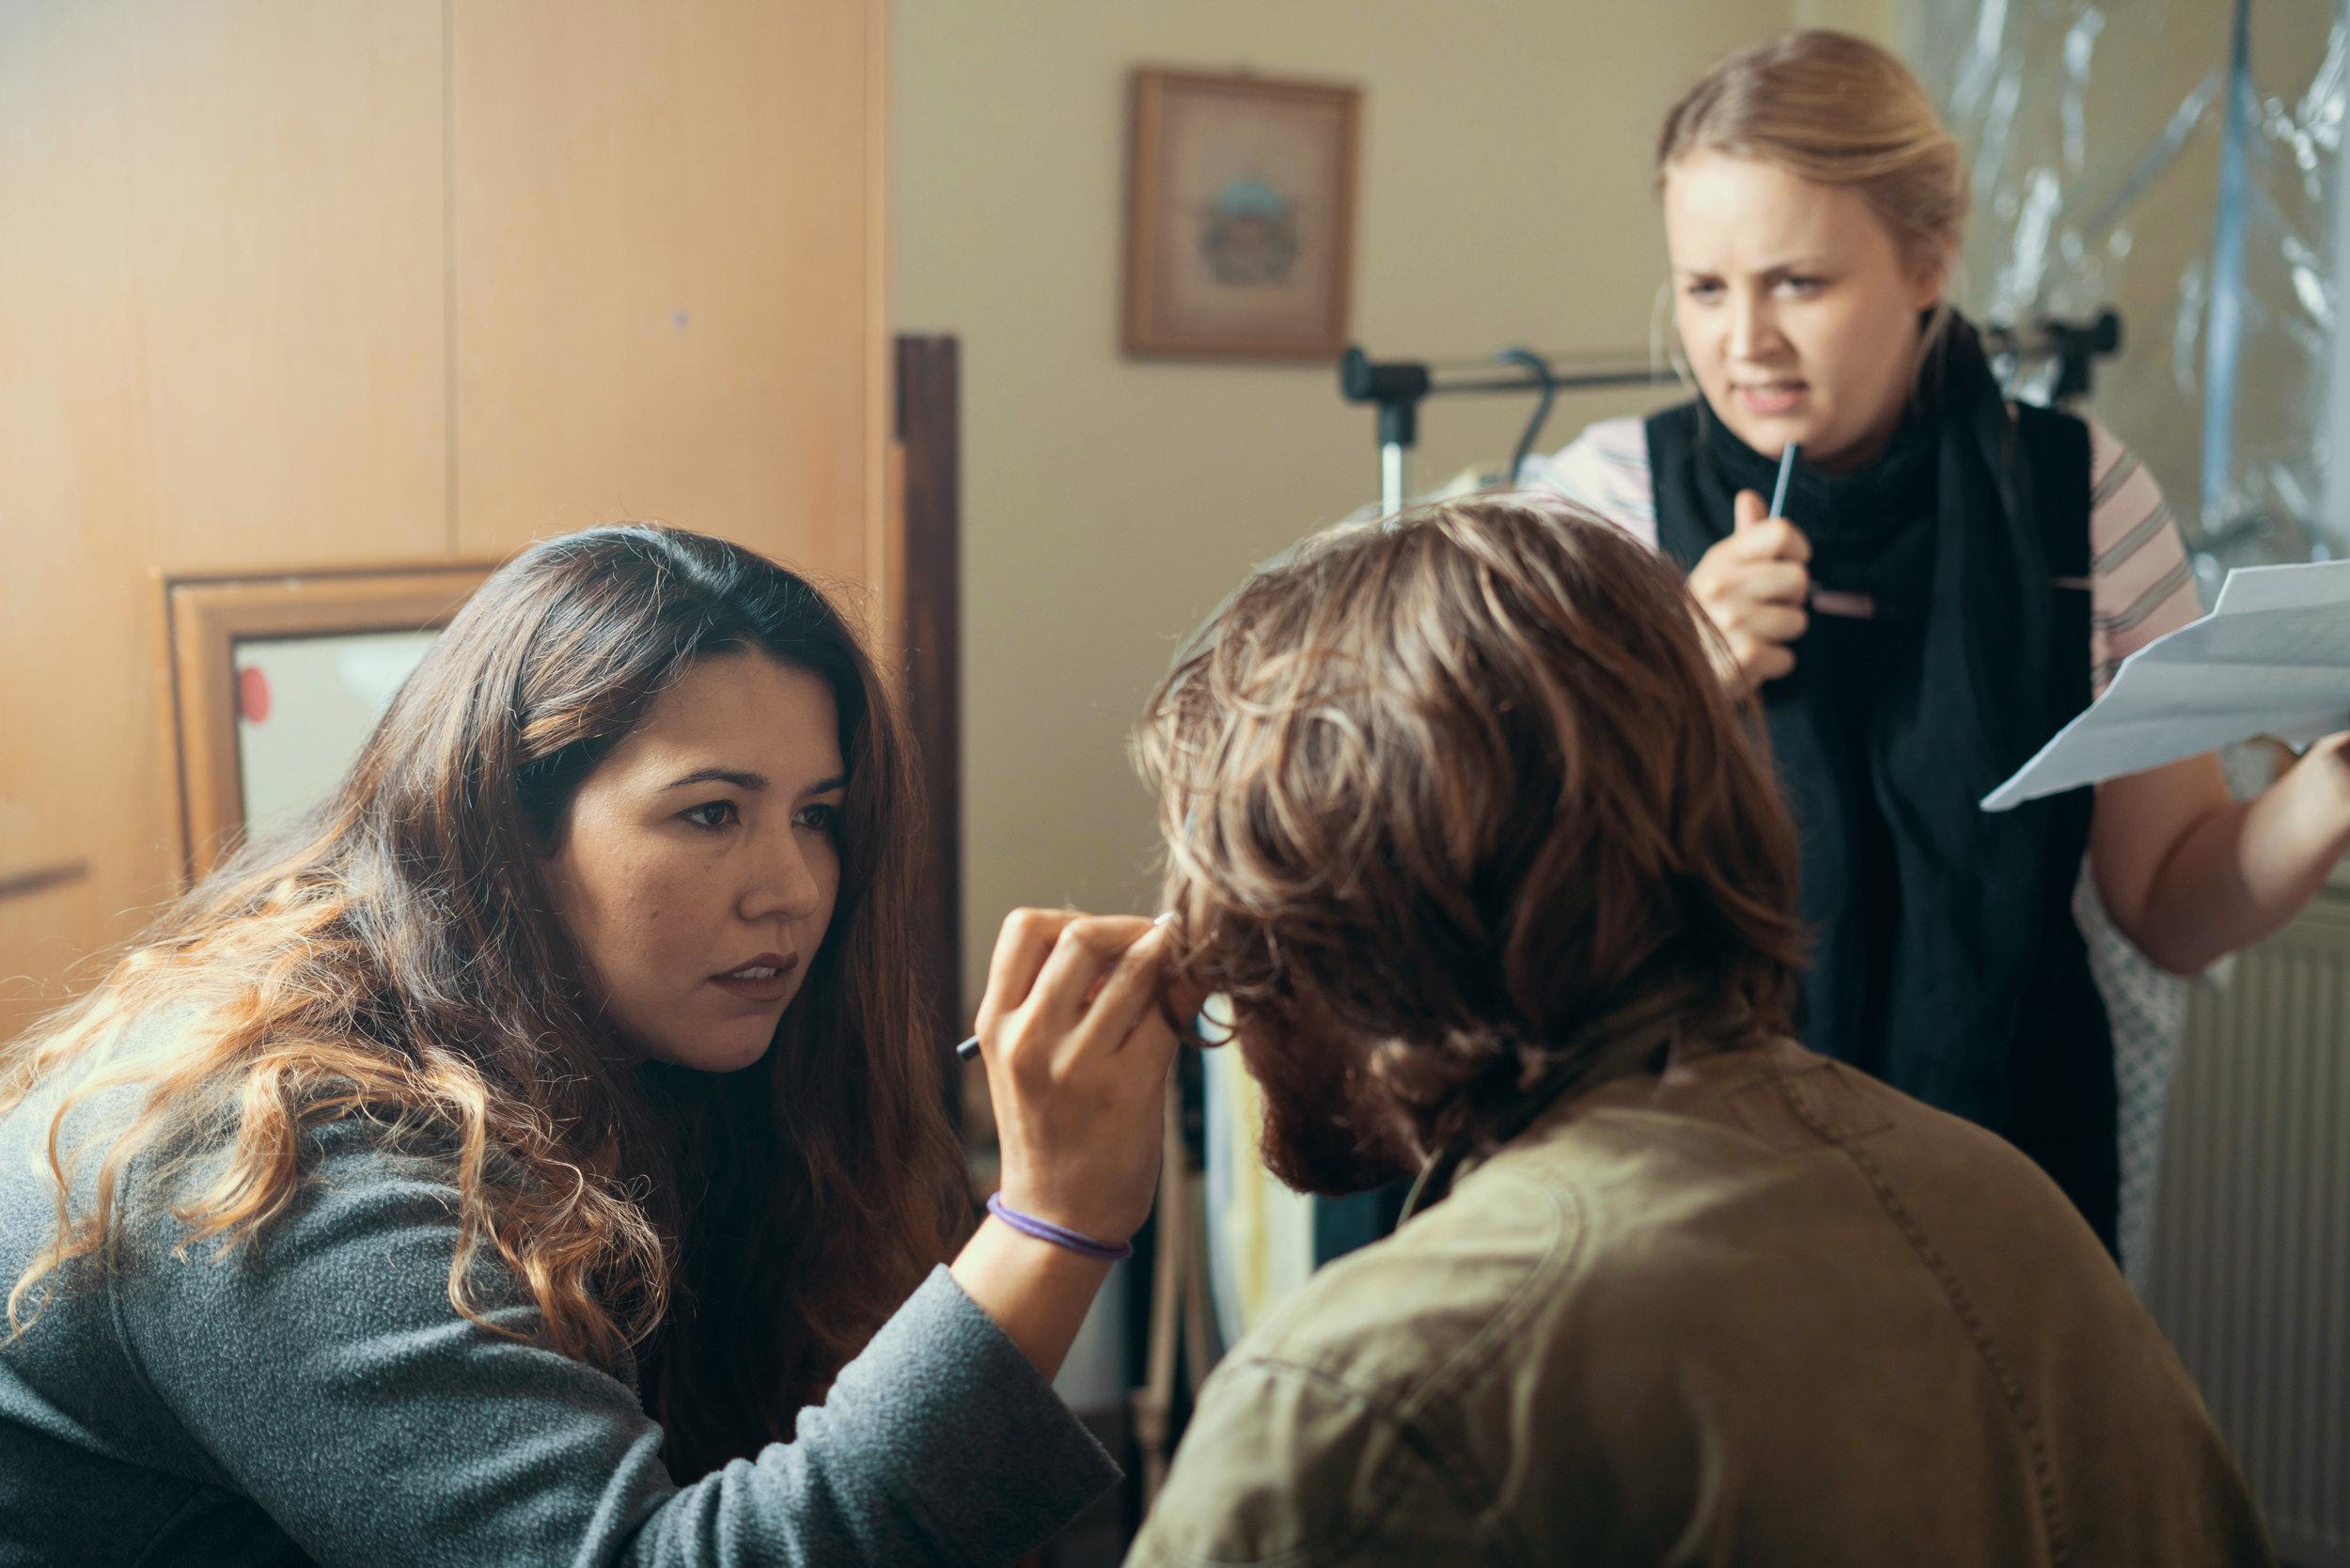 Hair and Make Up Designer Monica Montalvo and Costume Designer Sammy-May Buxton